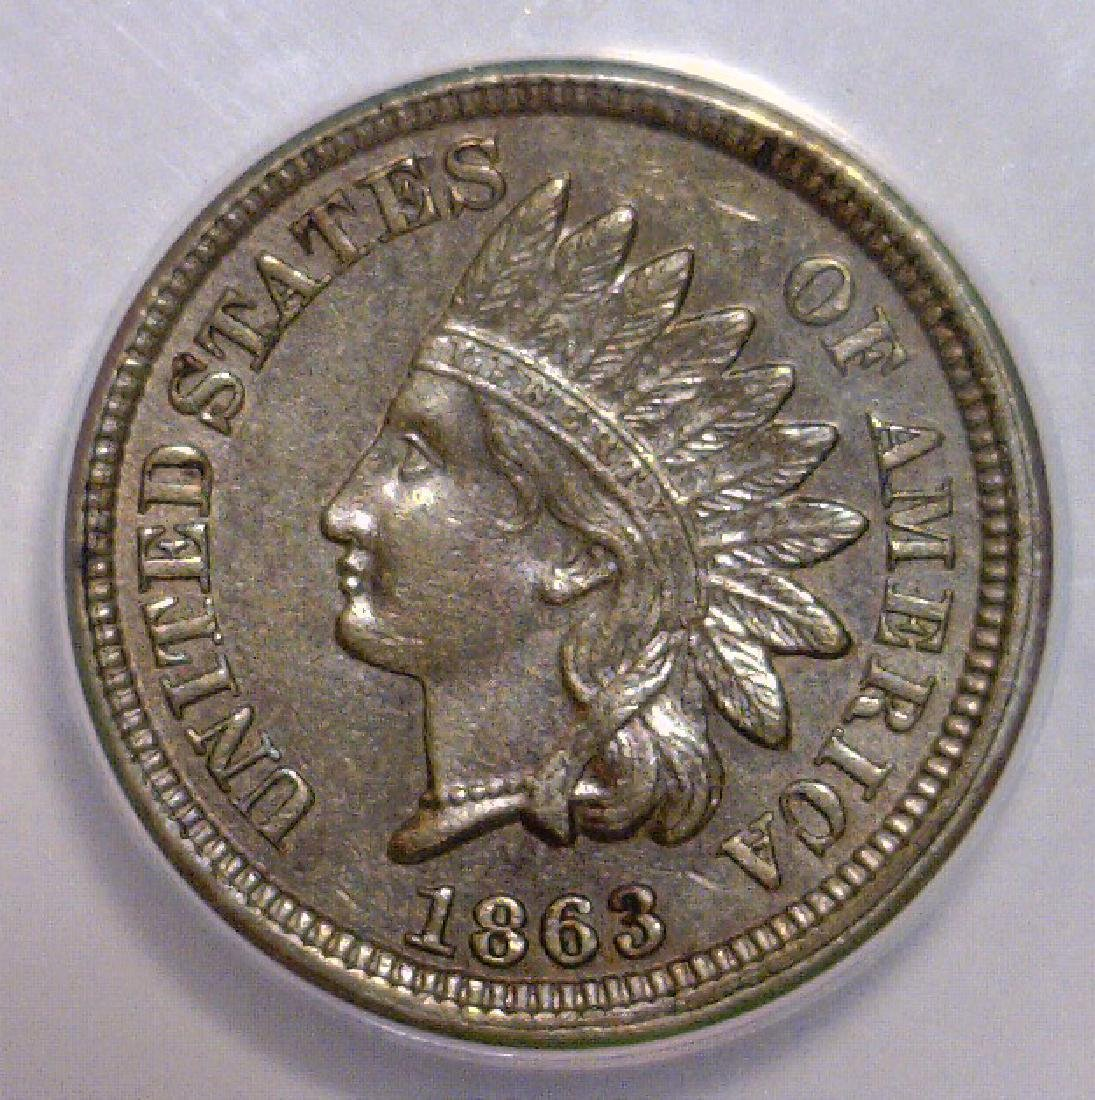 1863 Indian Head Cent ANACS Choice AU AU58